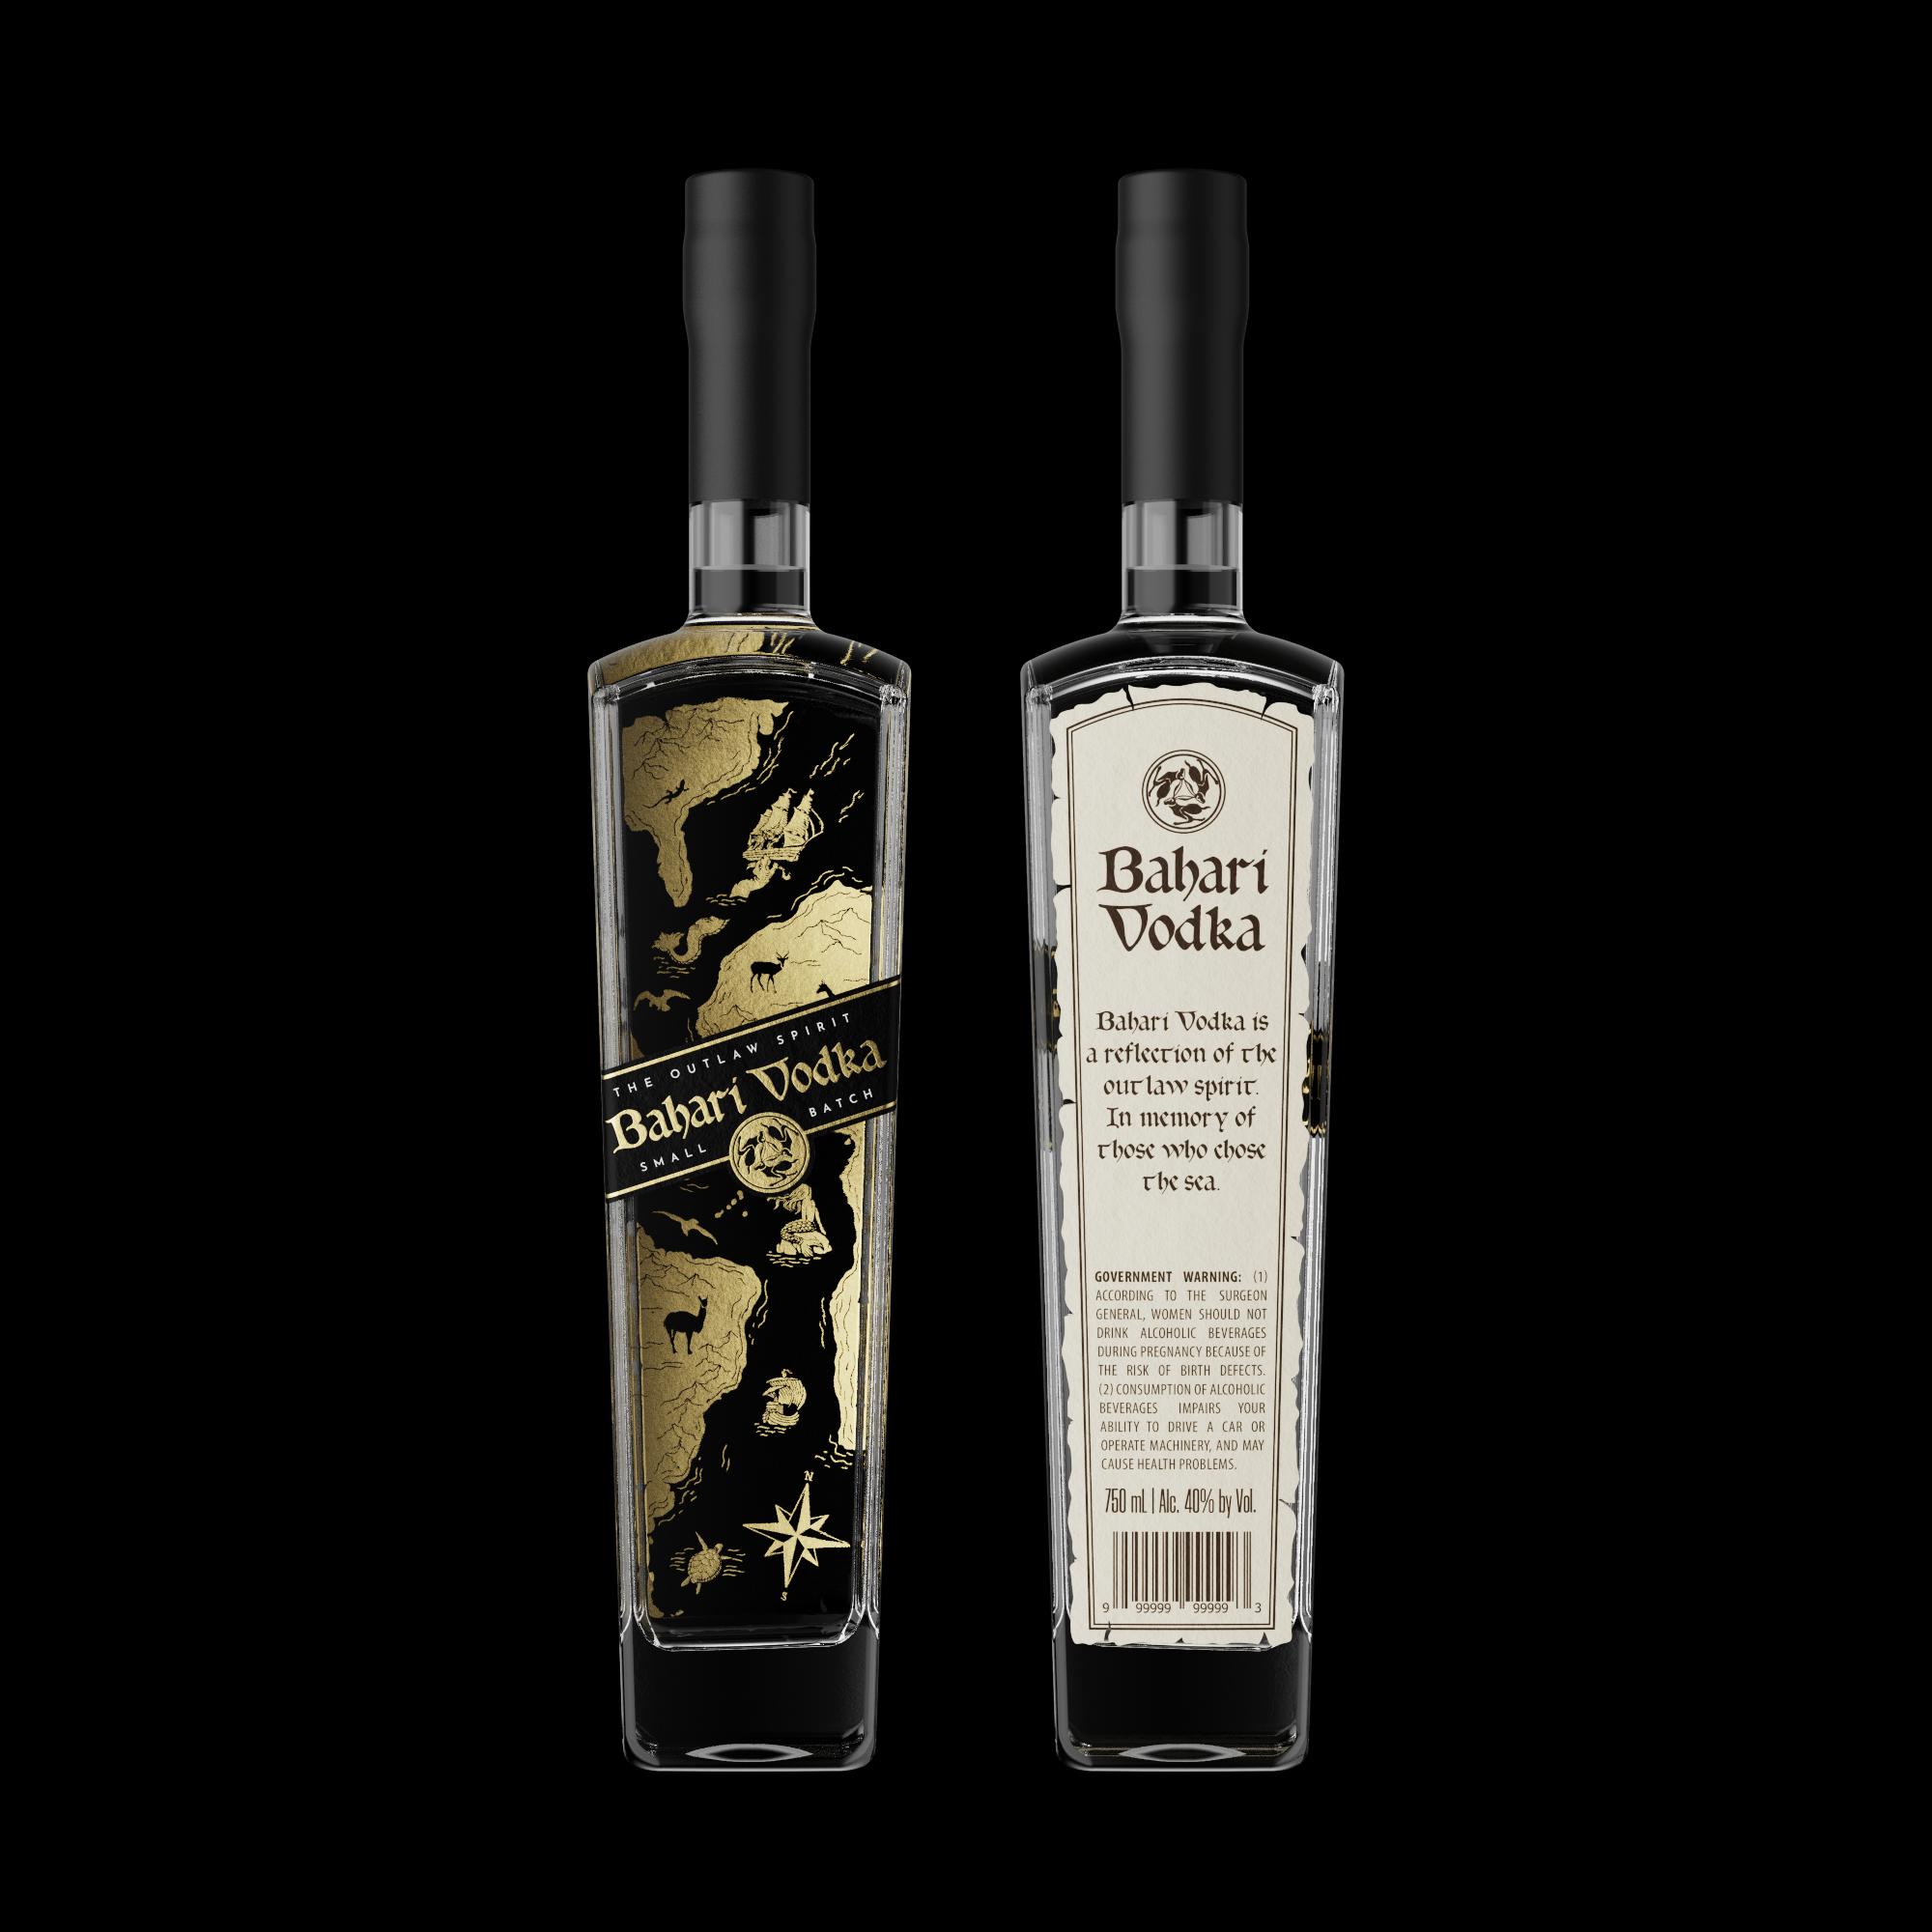 Label and bottle design for a handcrafted Vodka